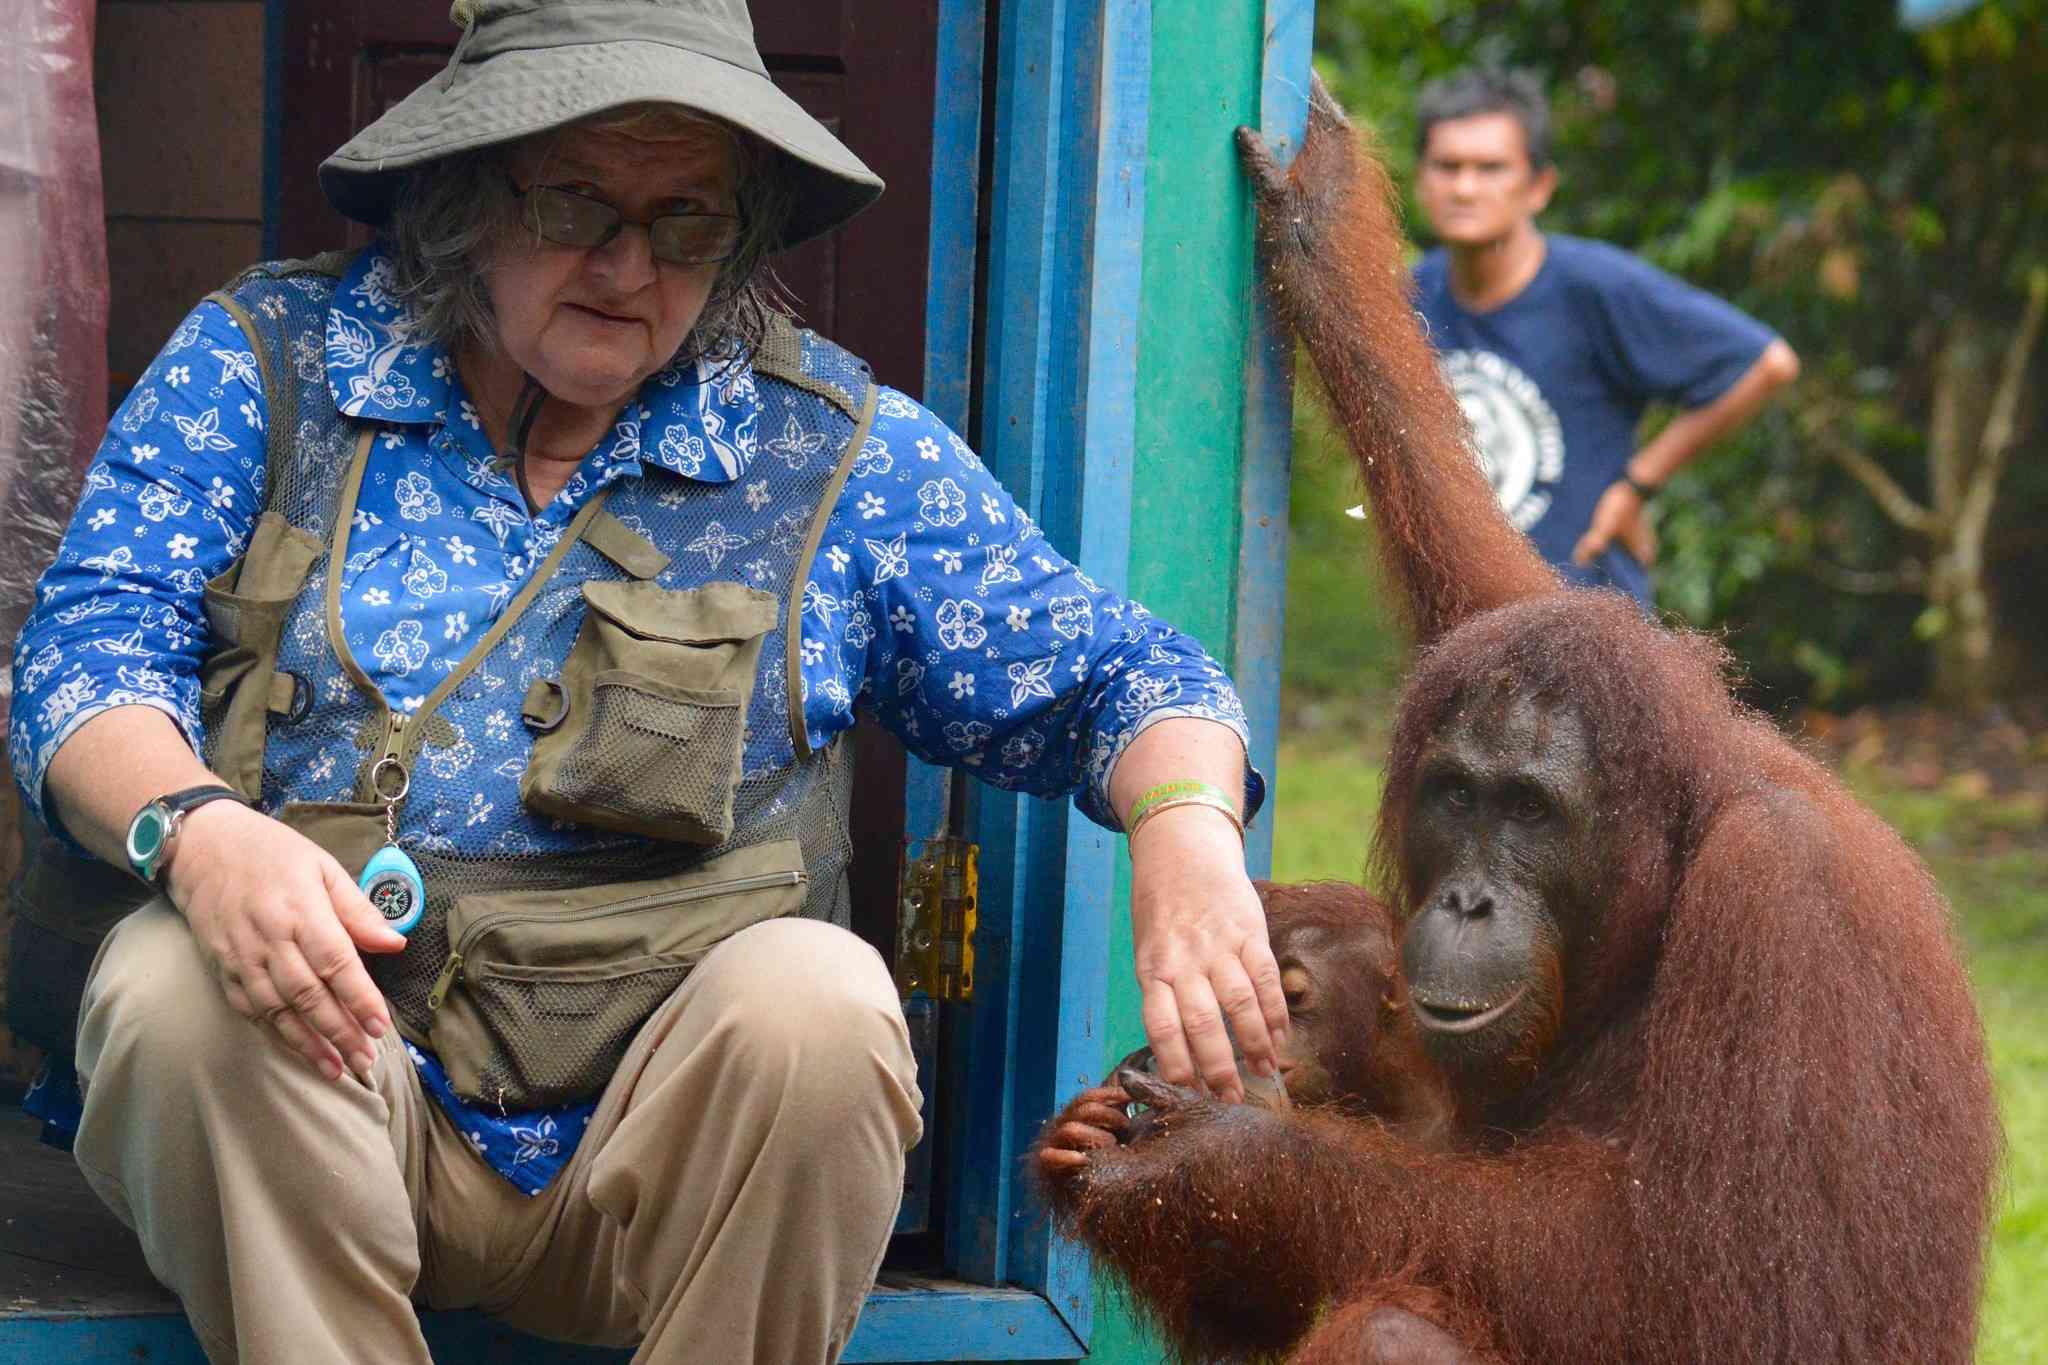 Birute Galdikas with an orangutan